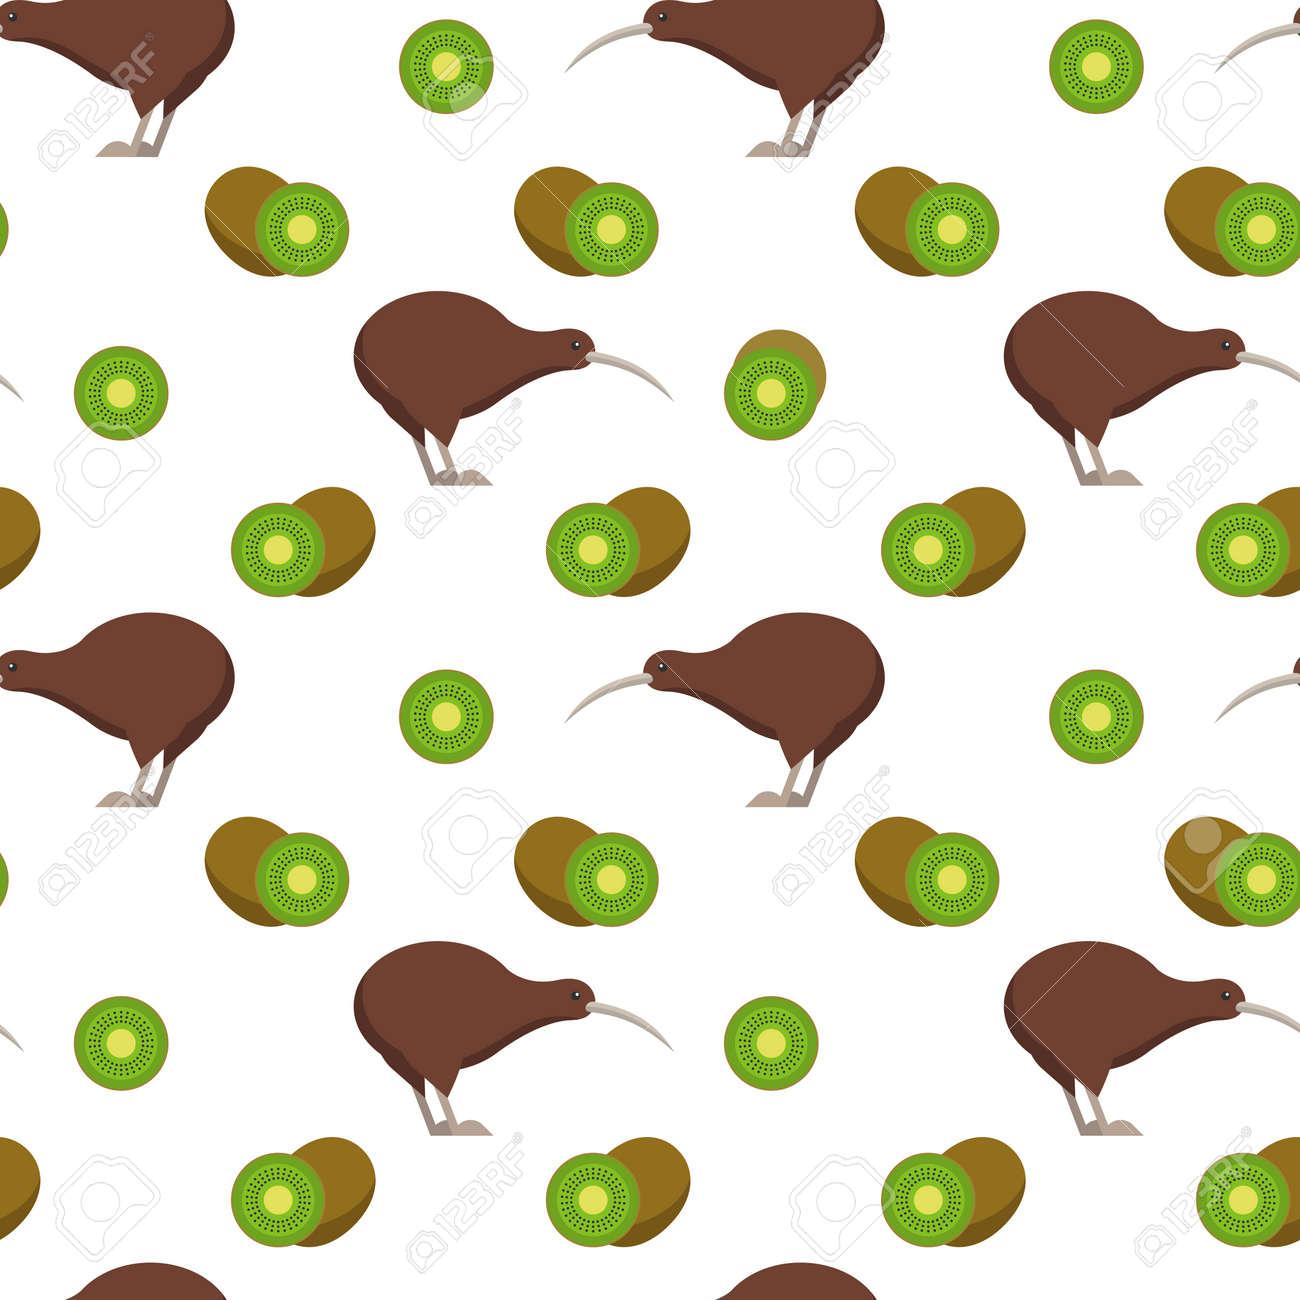 Seamless pattern with kiwi birds and kiwi fruits - 50705841